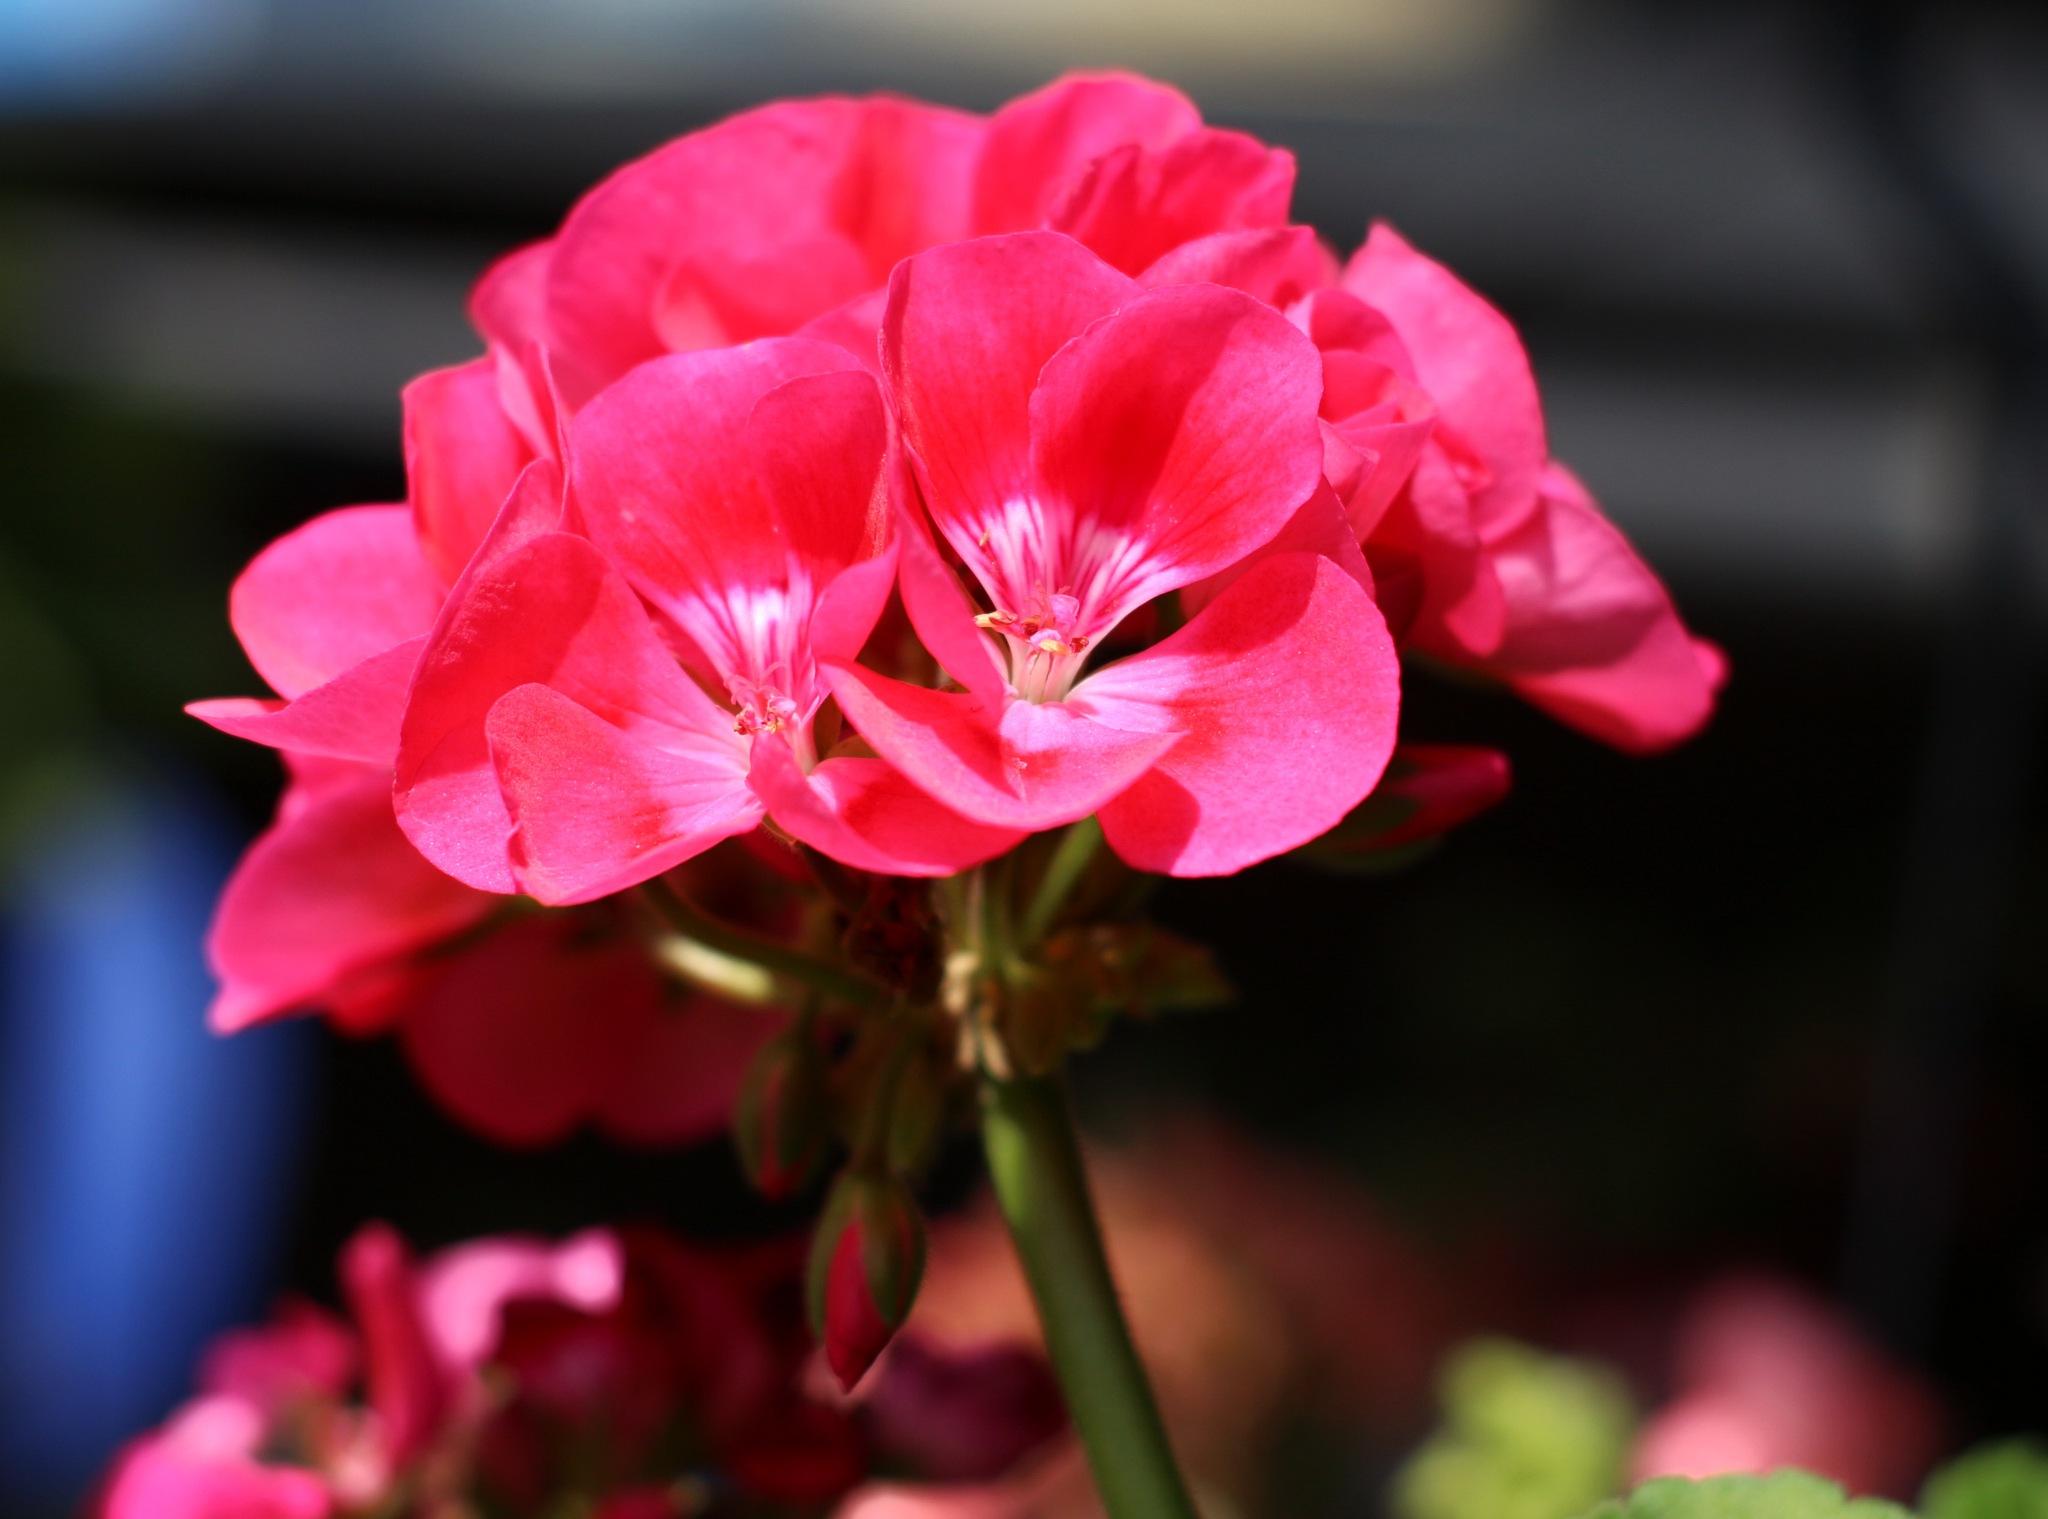 Geranium flowers. by Nestor